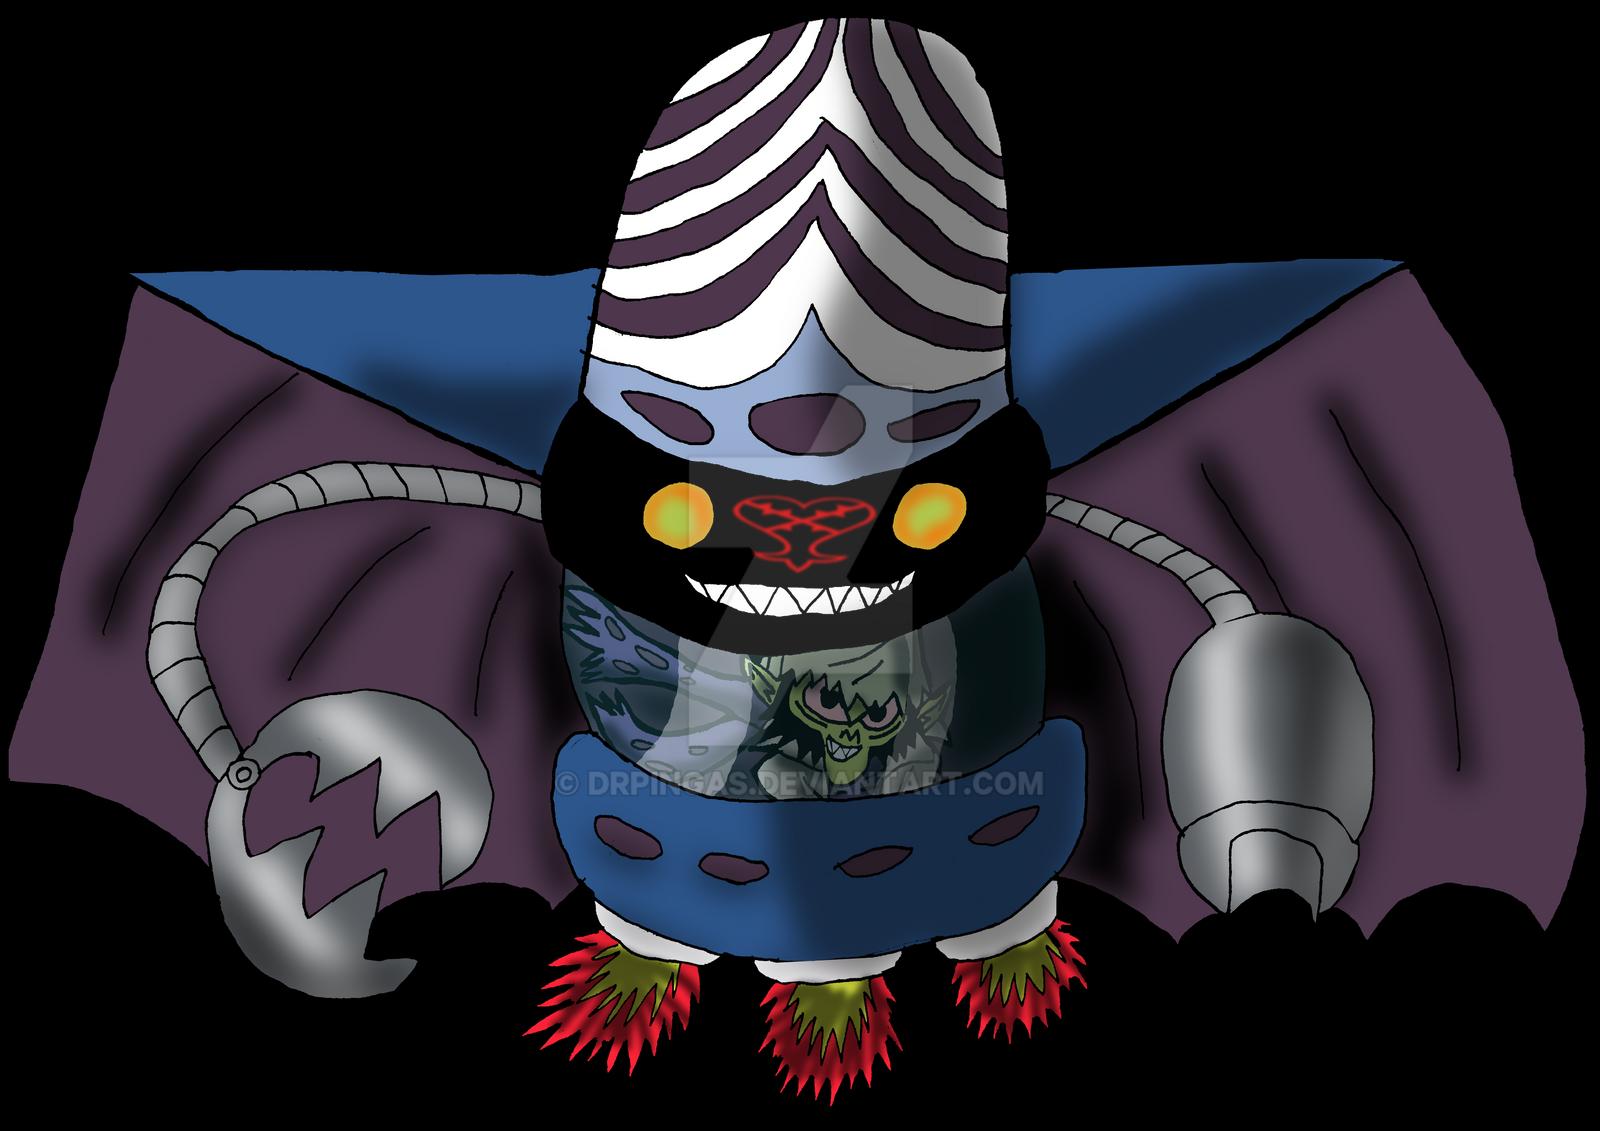 Mojo Jojo Kingdom Hearts JR by DrPingas